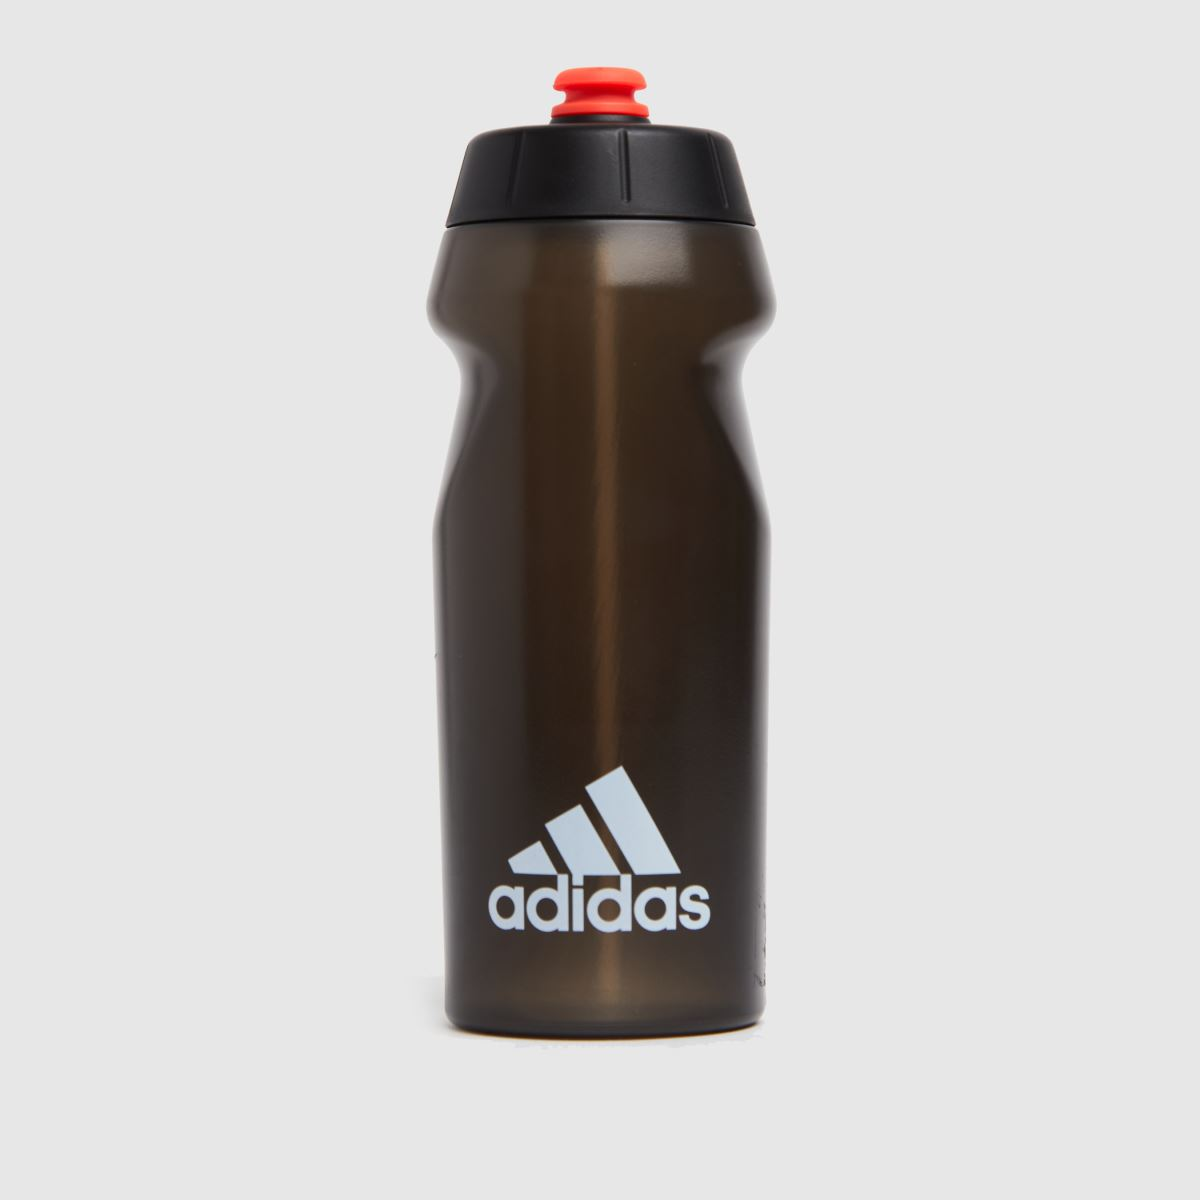 Adidas Black & White Perf Bottle 0.5